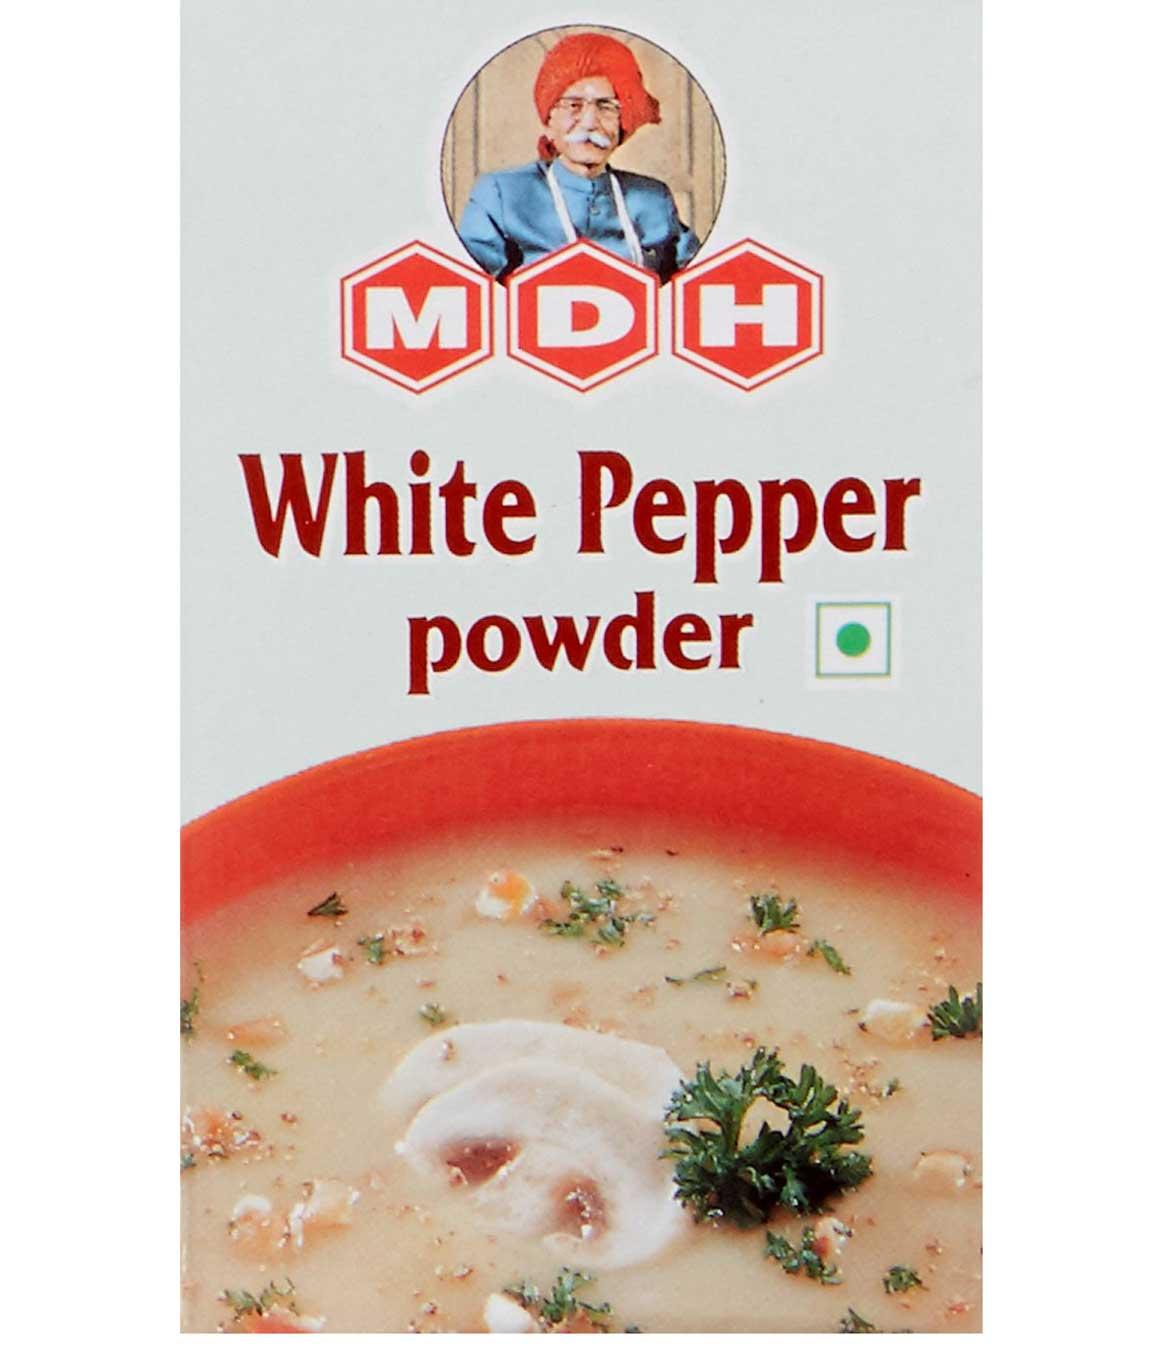 MDH White Pepper Powder, 100g